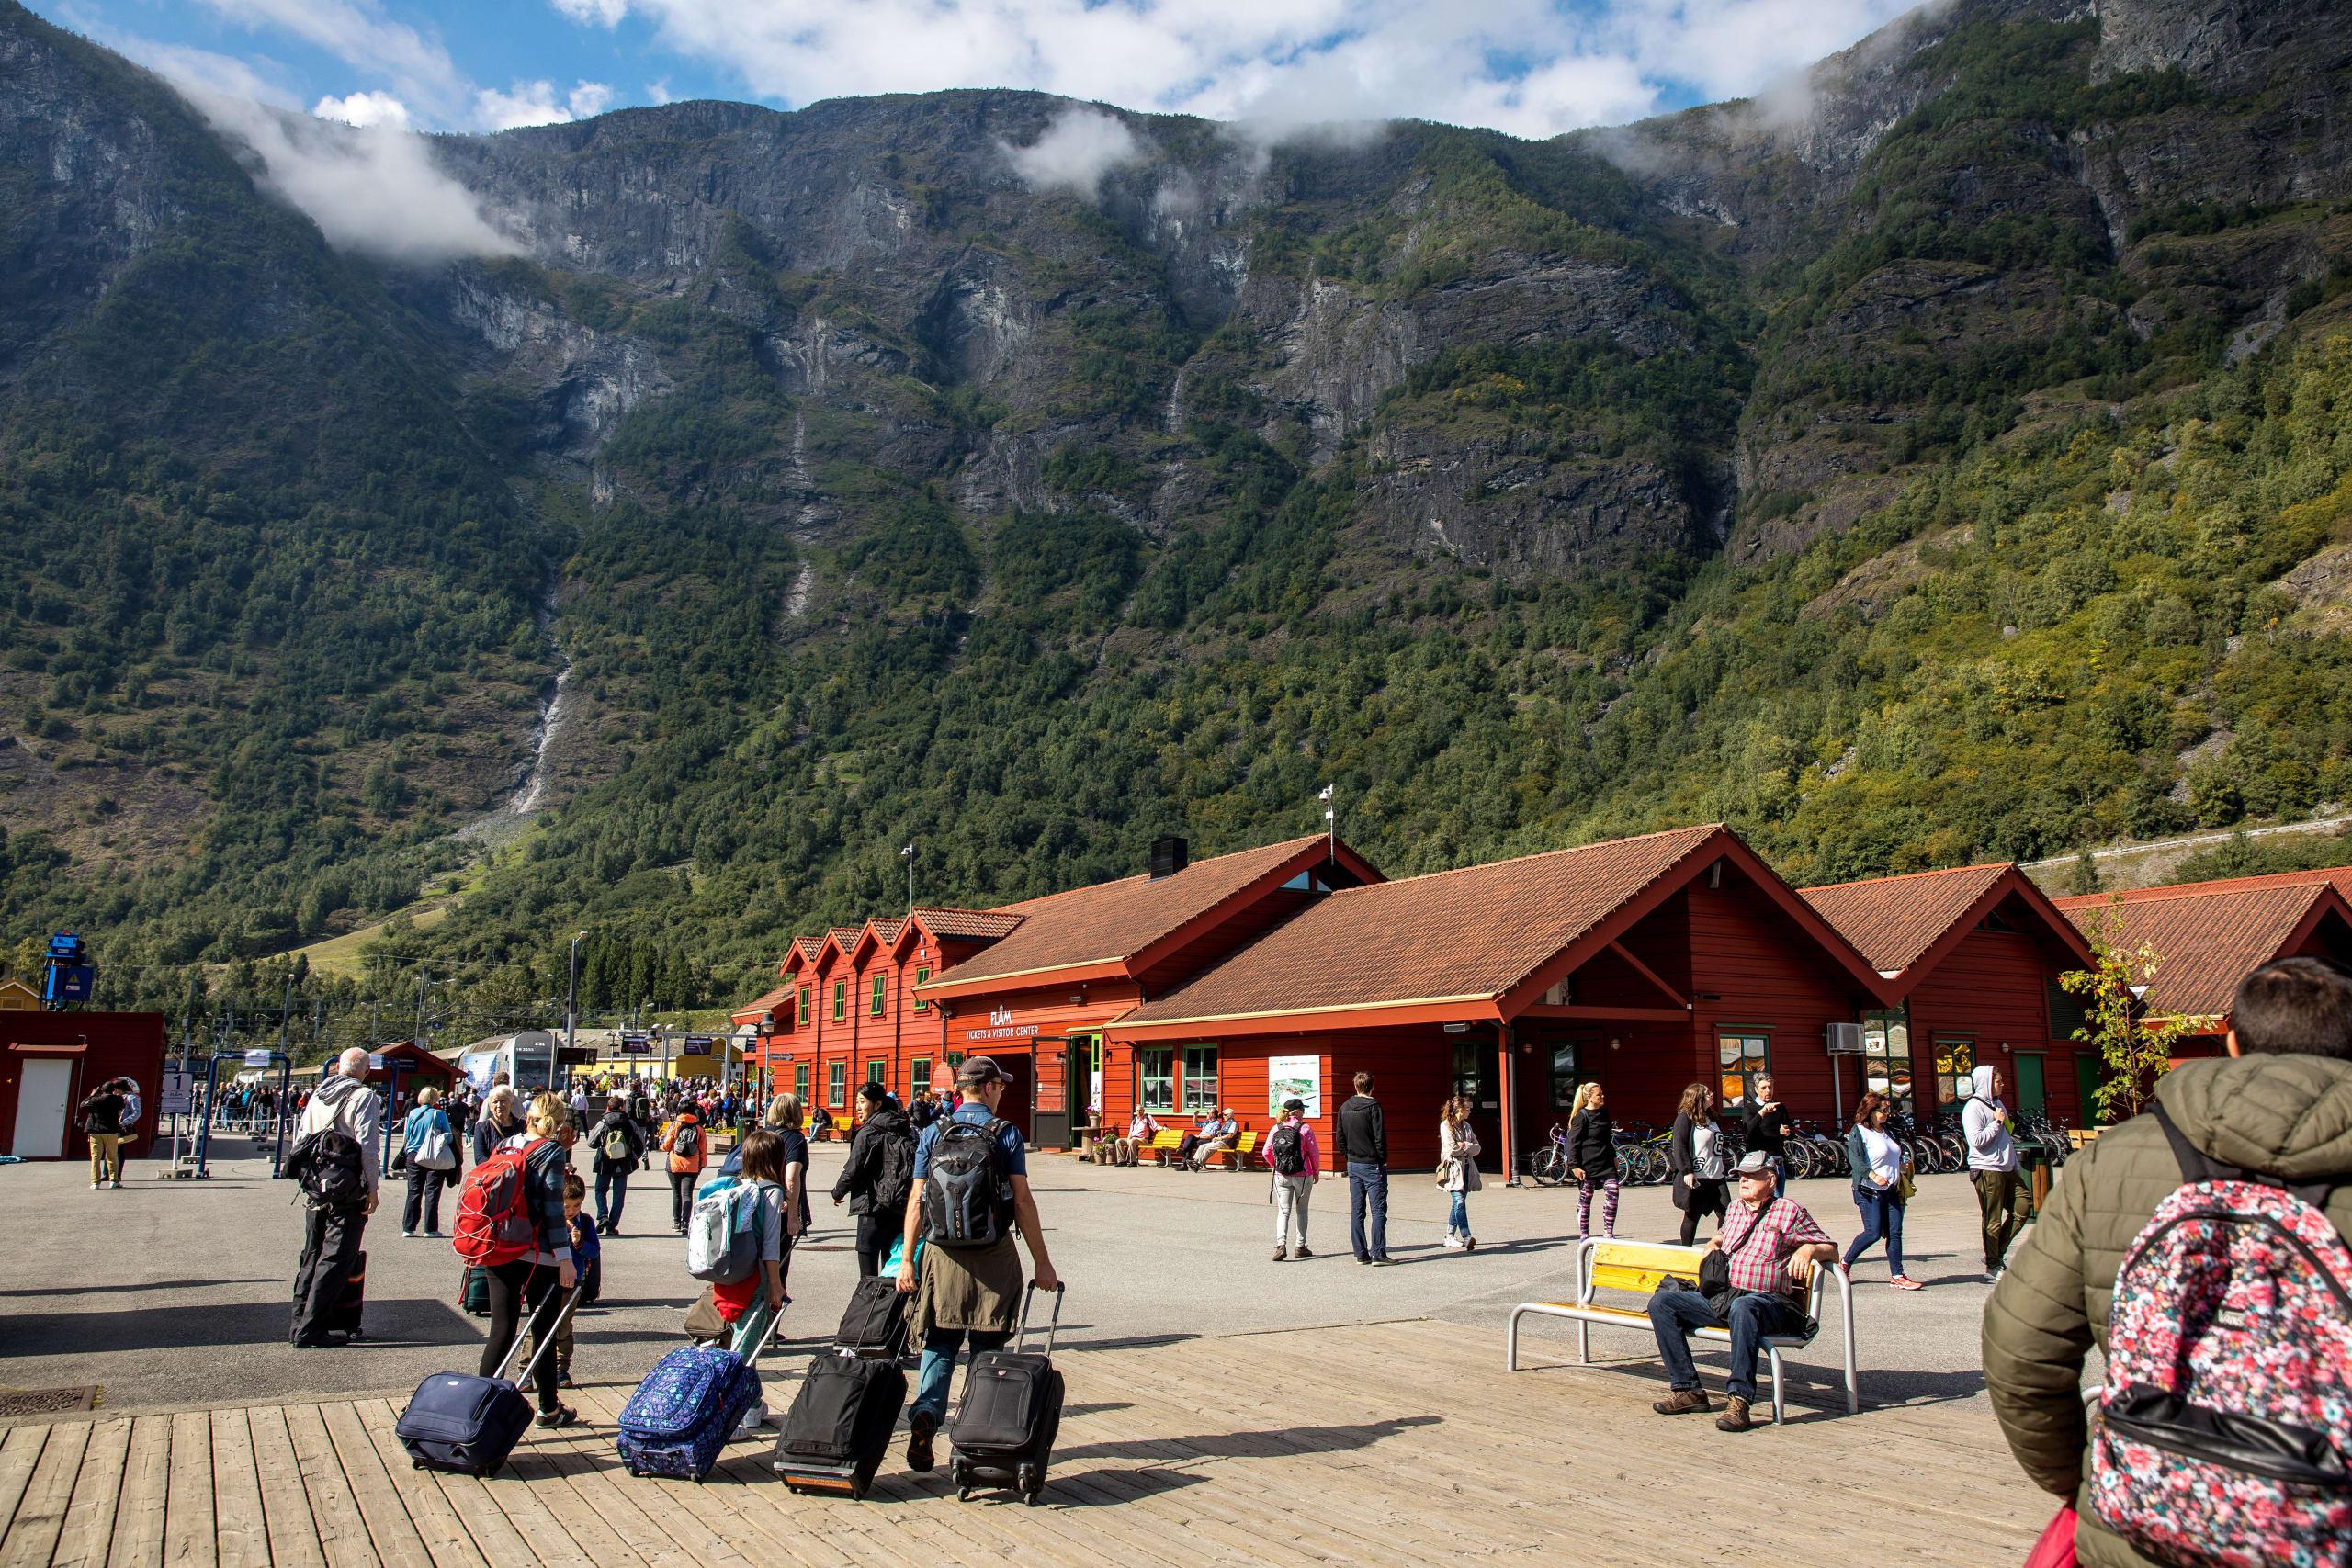 Turists in Flåm